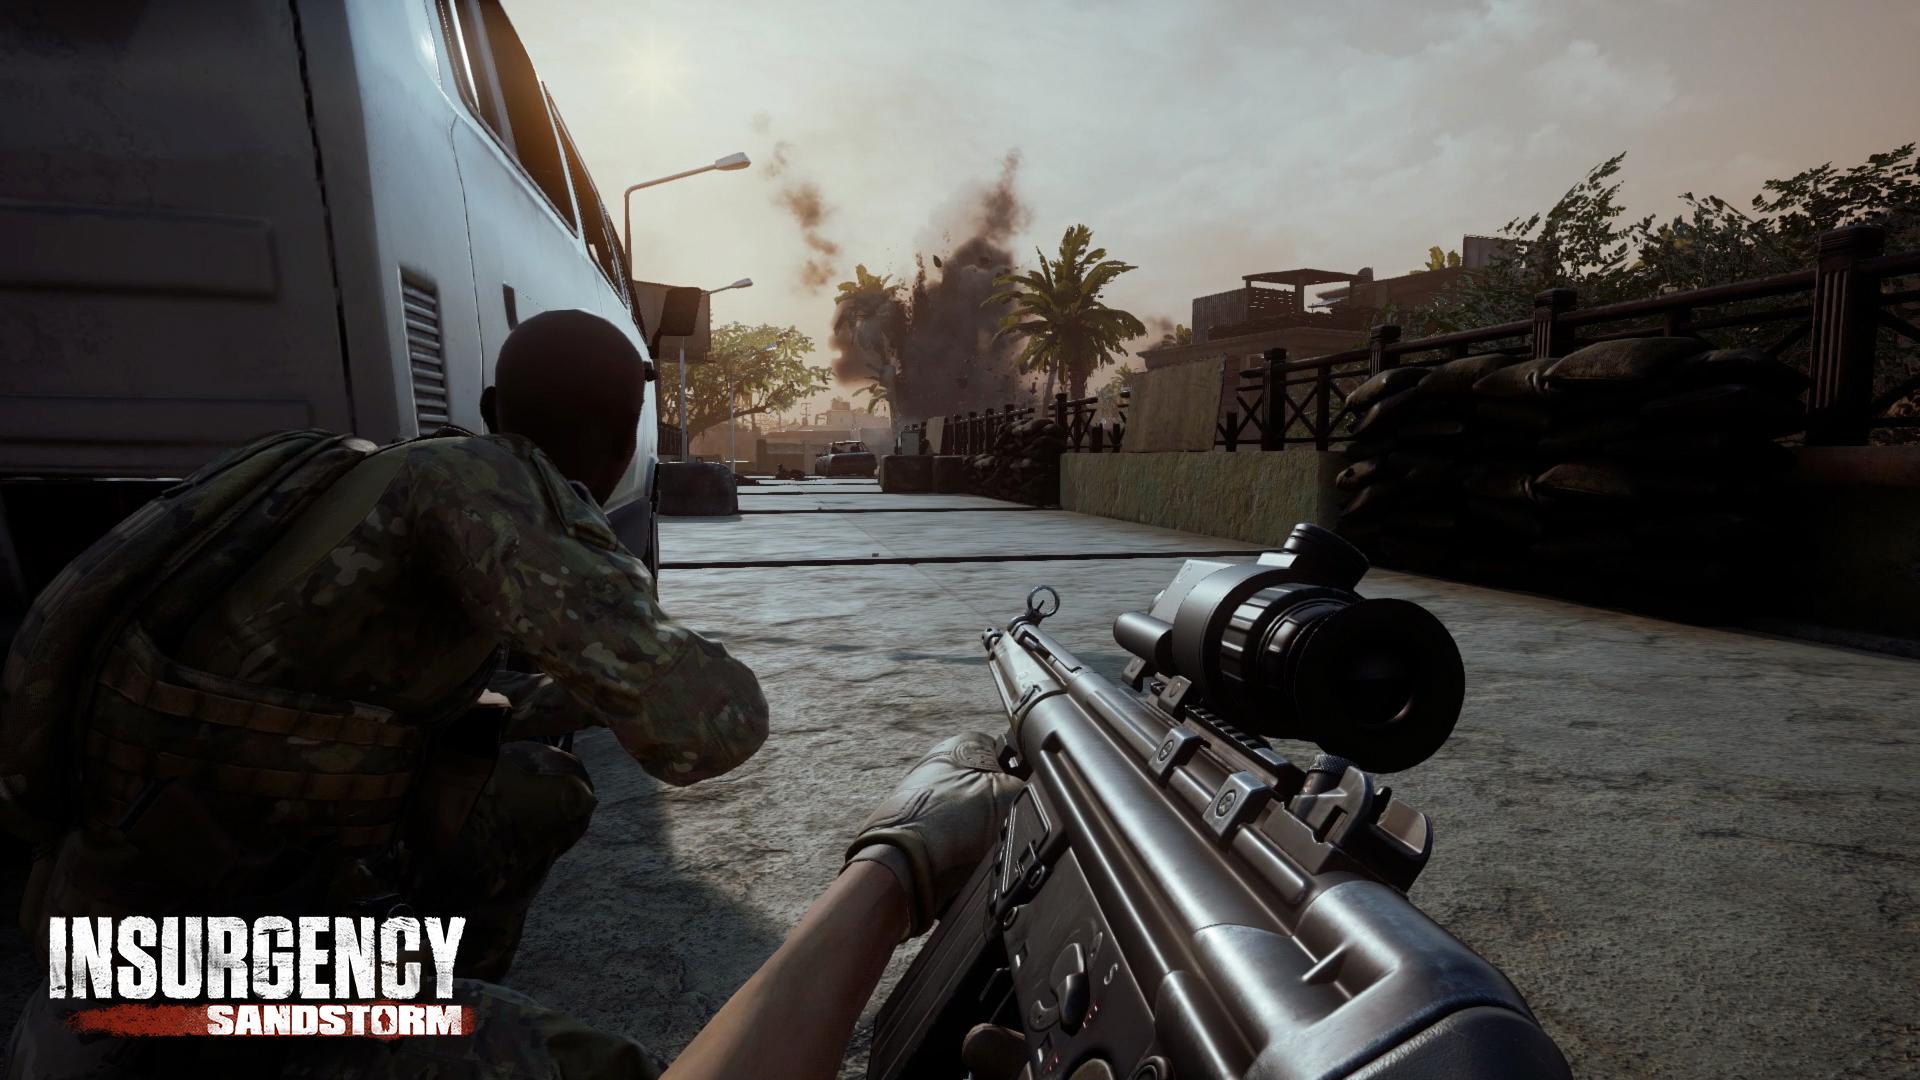 insurgency-sandstorm_38ubo.jpg